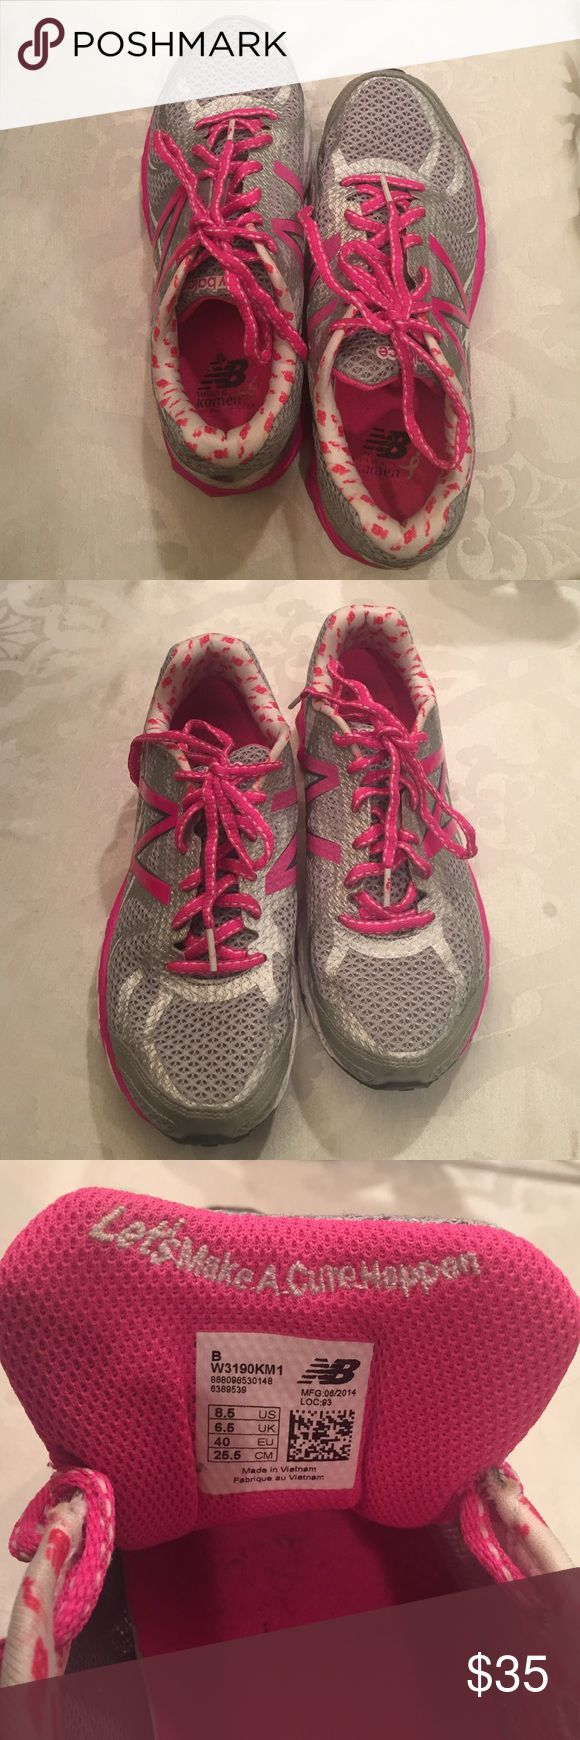 "New Balance RevLite 3190/ Size 8 1/2 B New Balance - Pink/ Gray / White Rev Lite 3190 sneakers / lightly worn /          Susan G Komen            ""Let's Make A Cure Happen!""     Size 8 1/2 B New Balance Shoes Athletic Shoes"